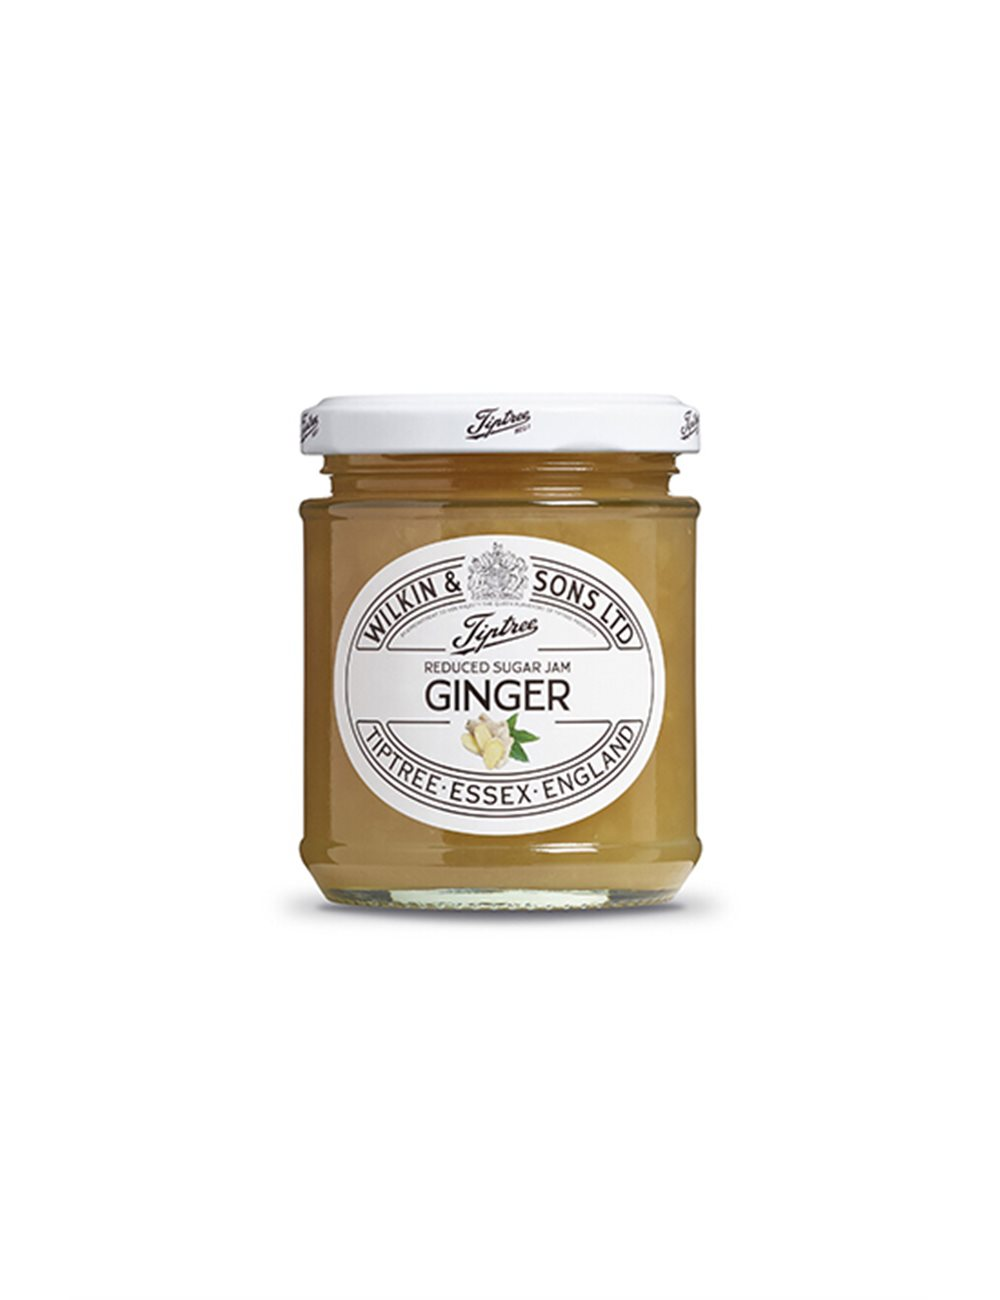 Reduced Sugar Preserve Ginger Marmalade 80% 200g